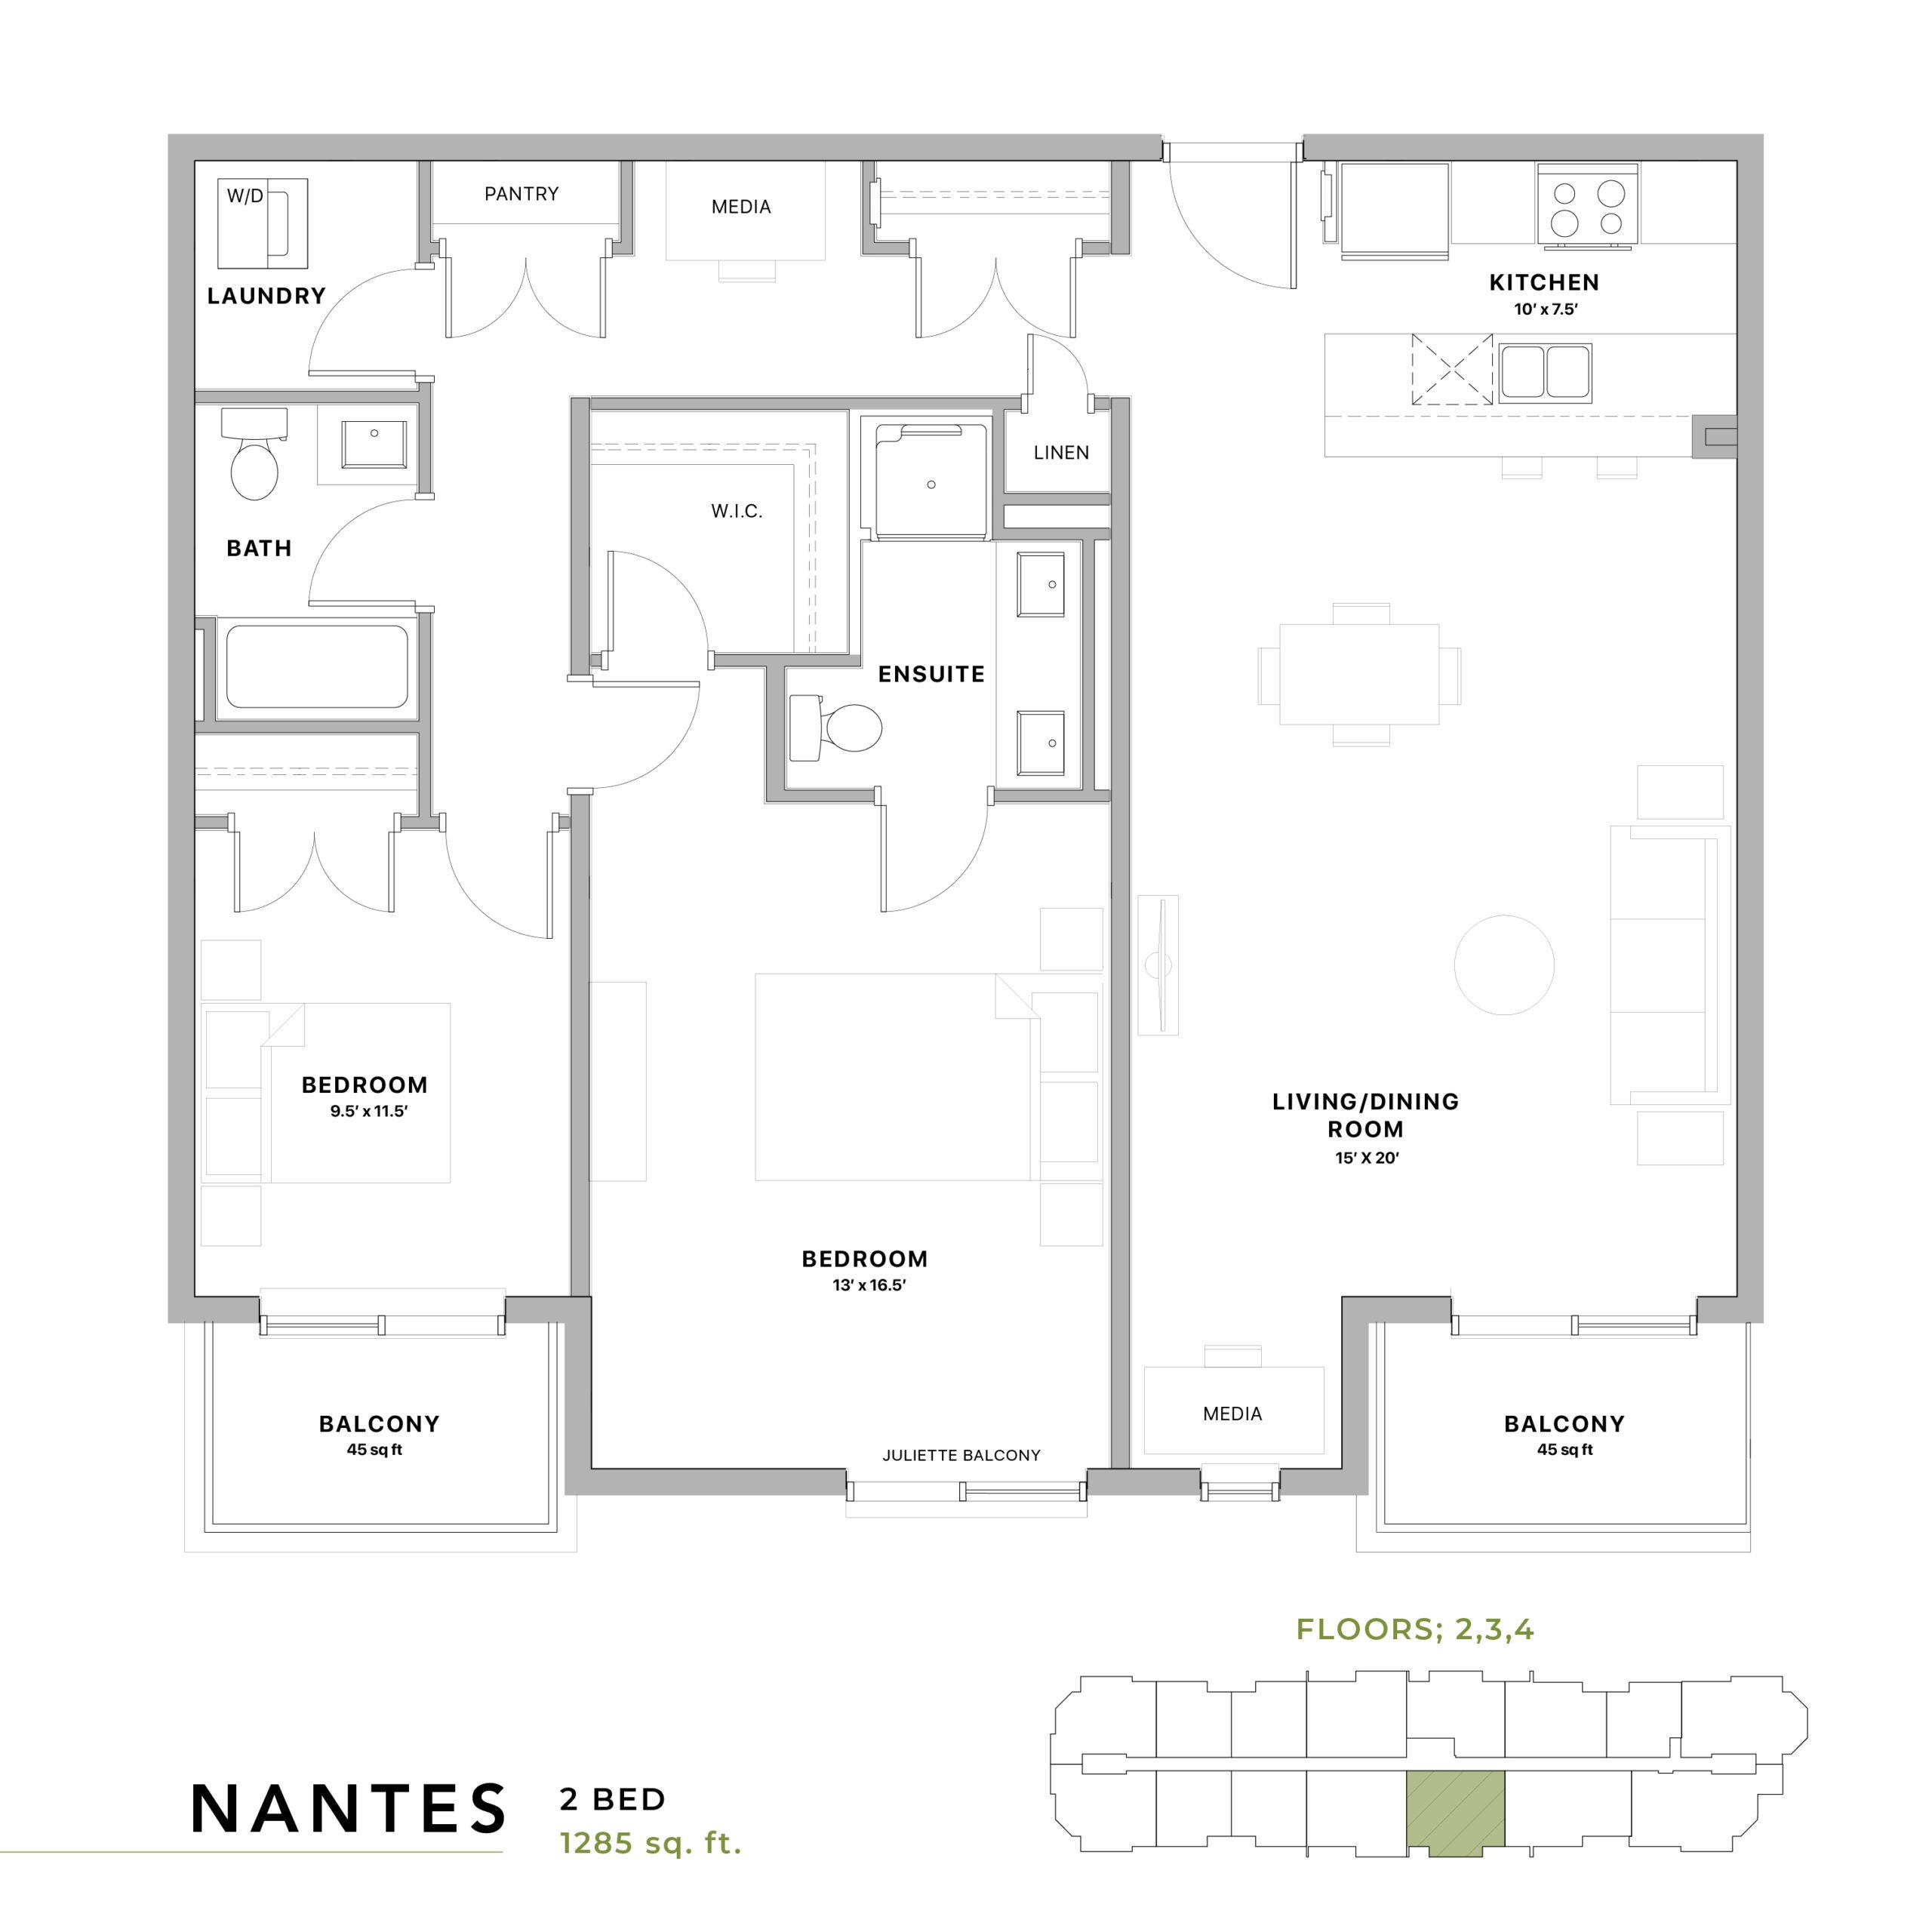 Nantes Floorplan